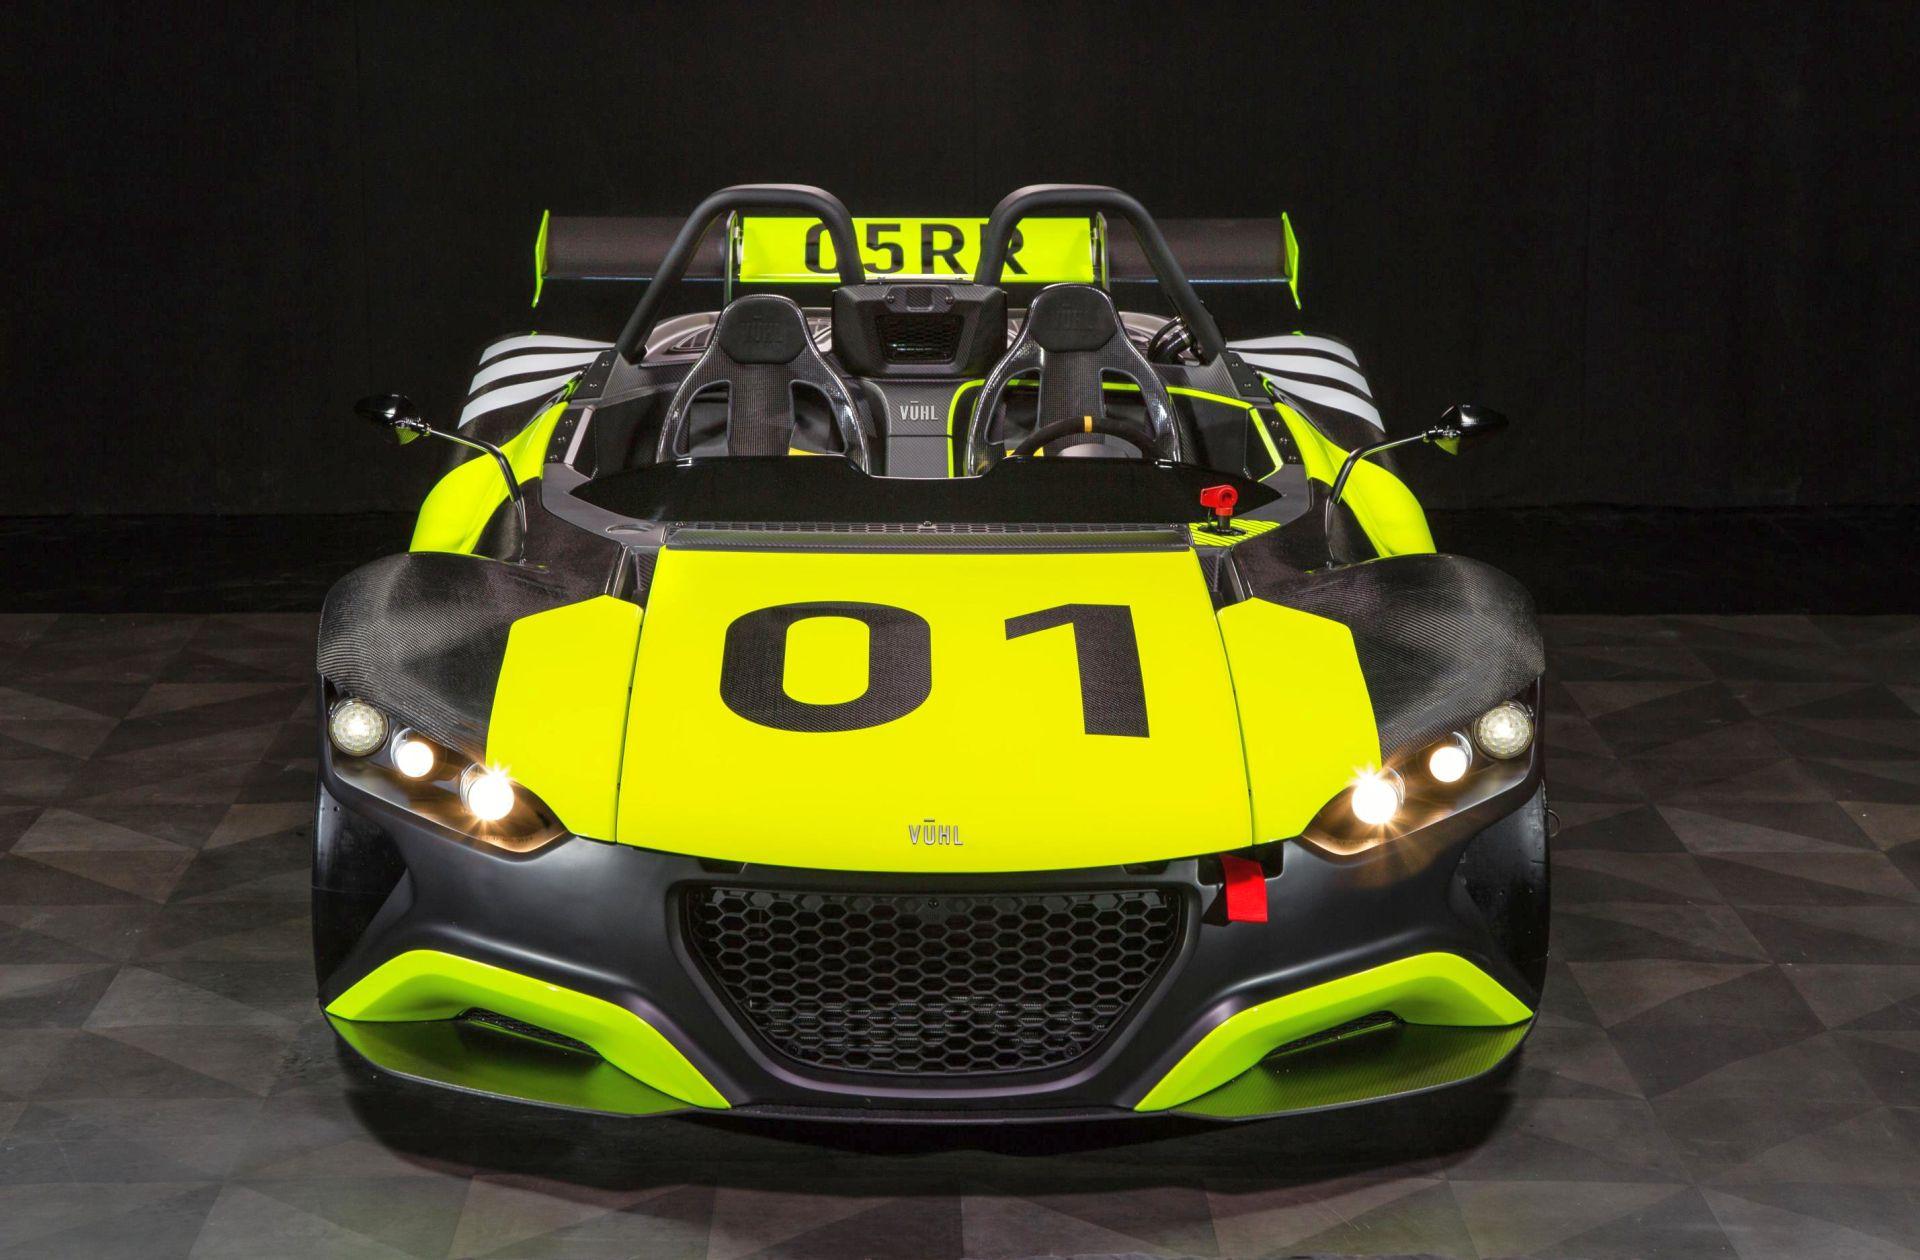 Vuhl 05RR a debutat la Cursa Campionilor | Știri | AUTO BILD